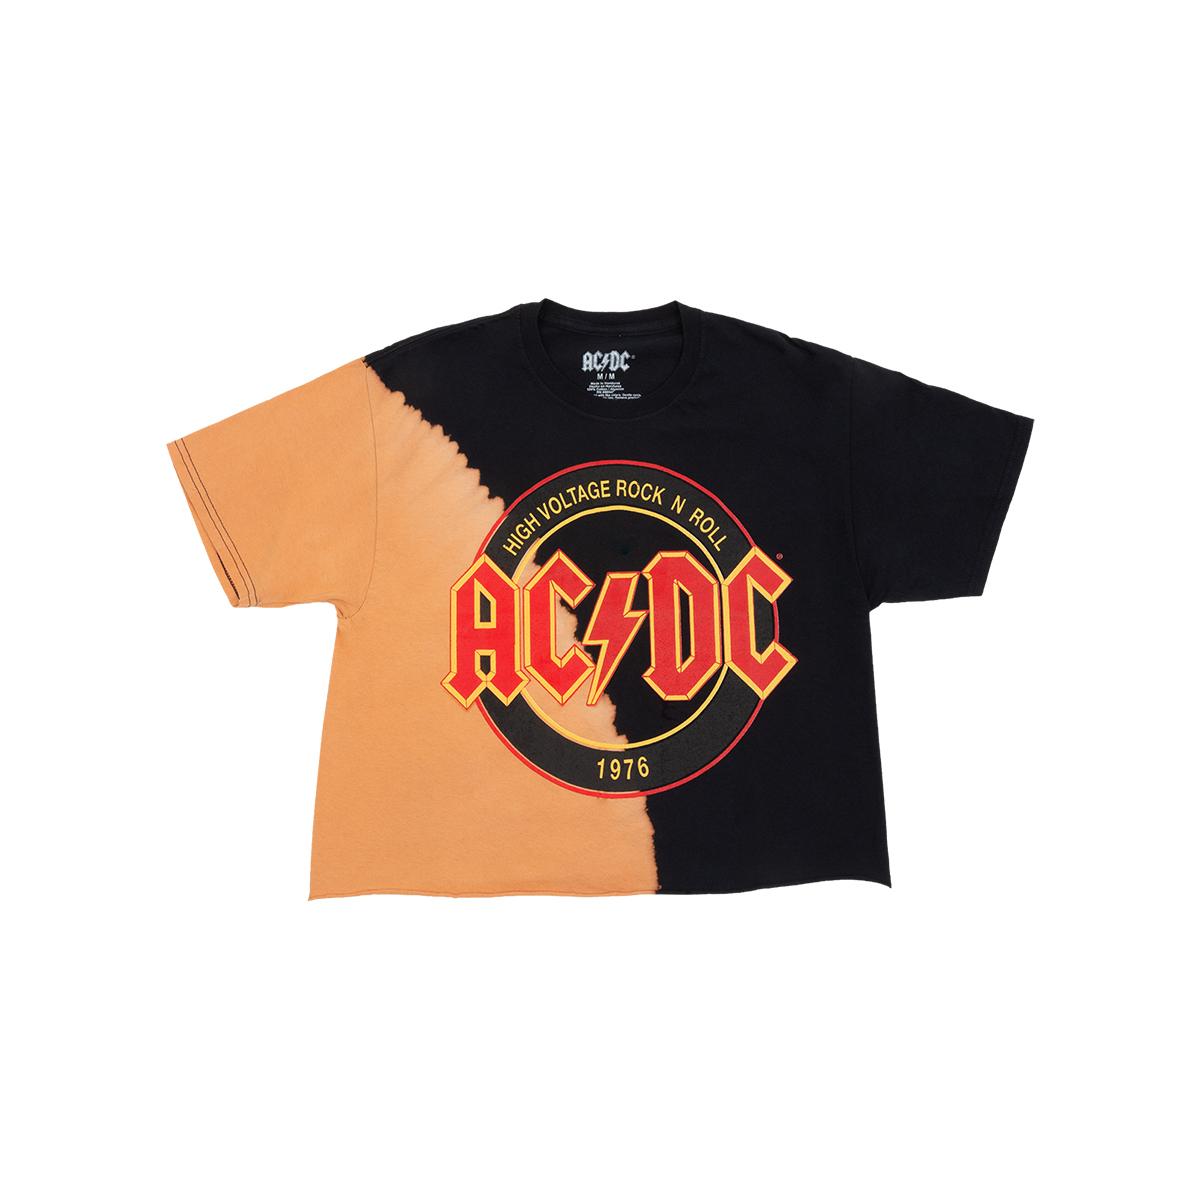 AC/DC - High Voltage Bleached Black Crop Top